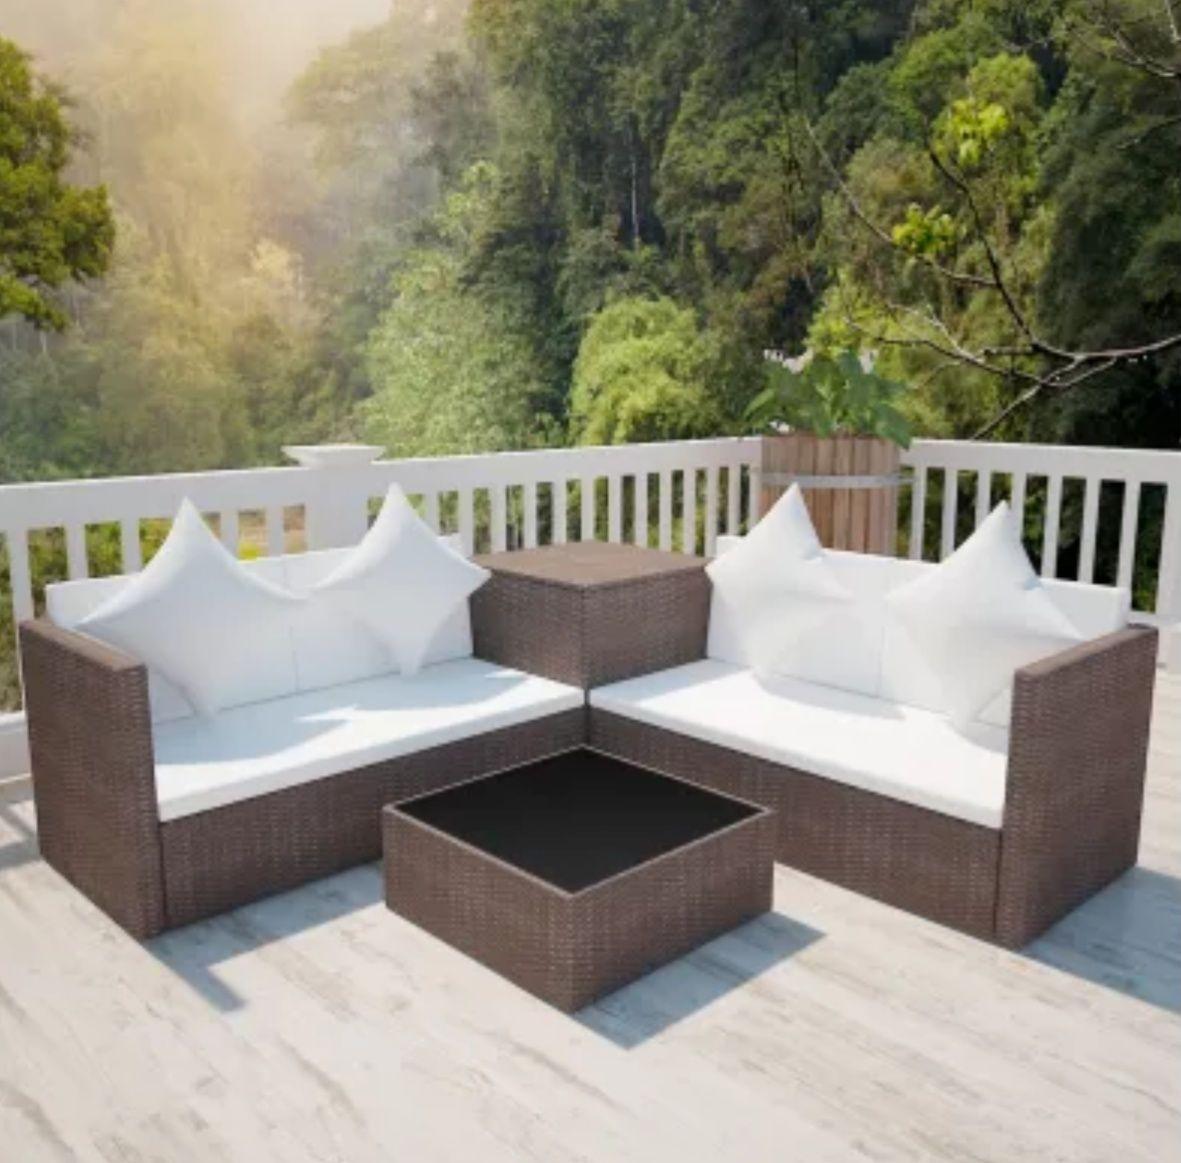 EBay vidaXL Garten-Sofagarnitur 14-tlg. Poly Rattan Braun